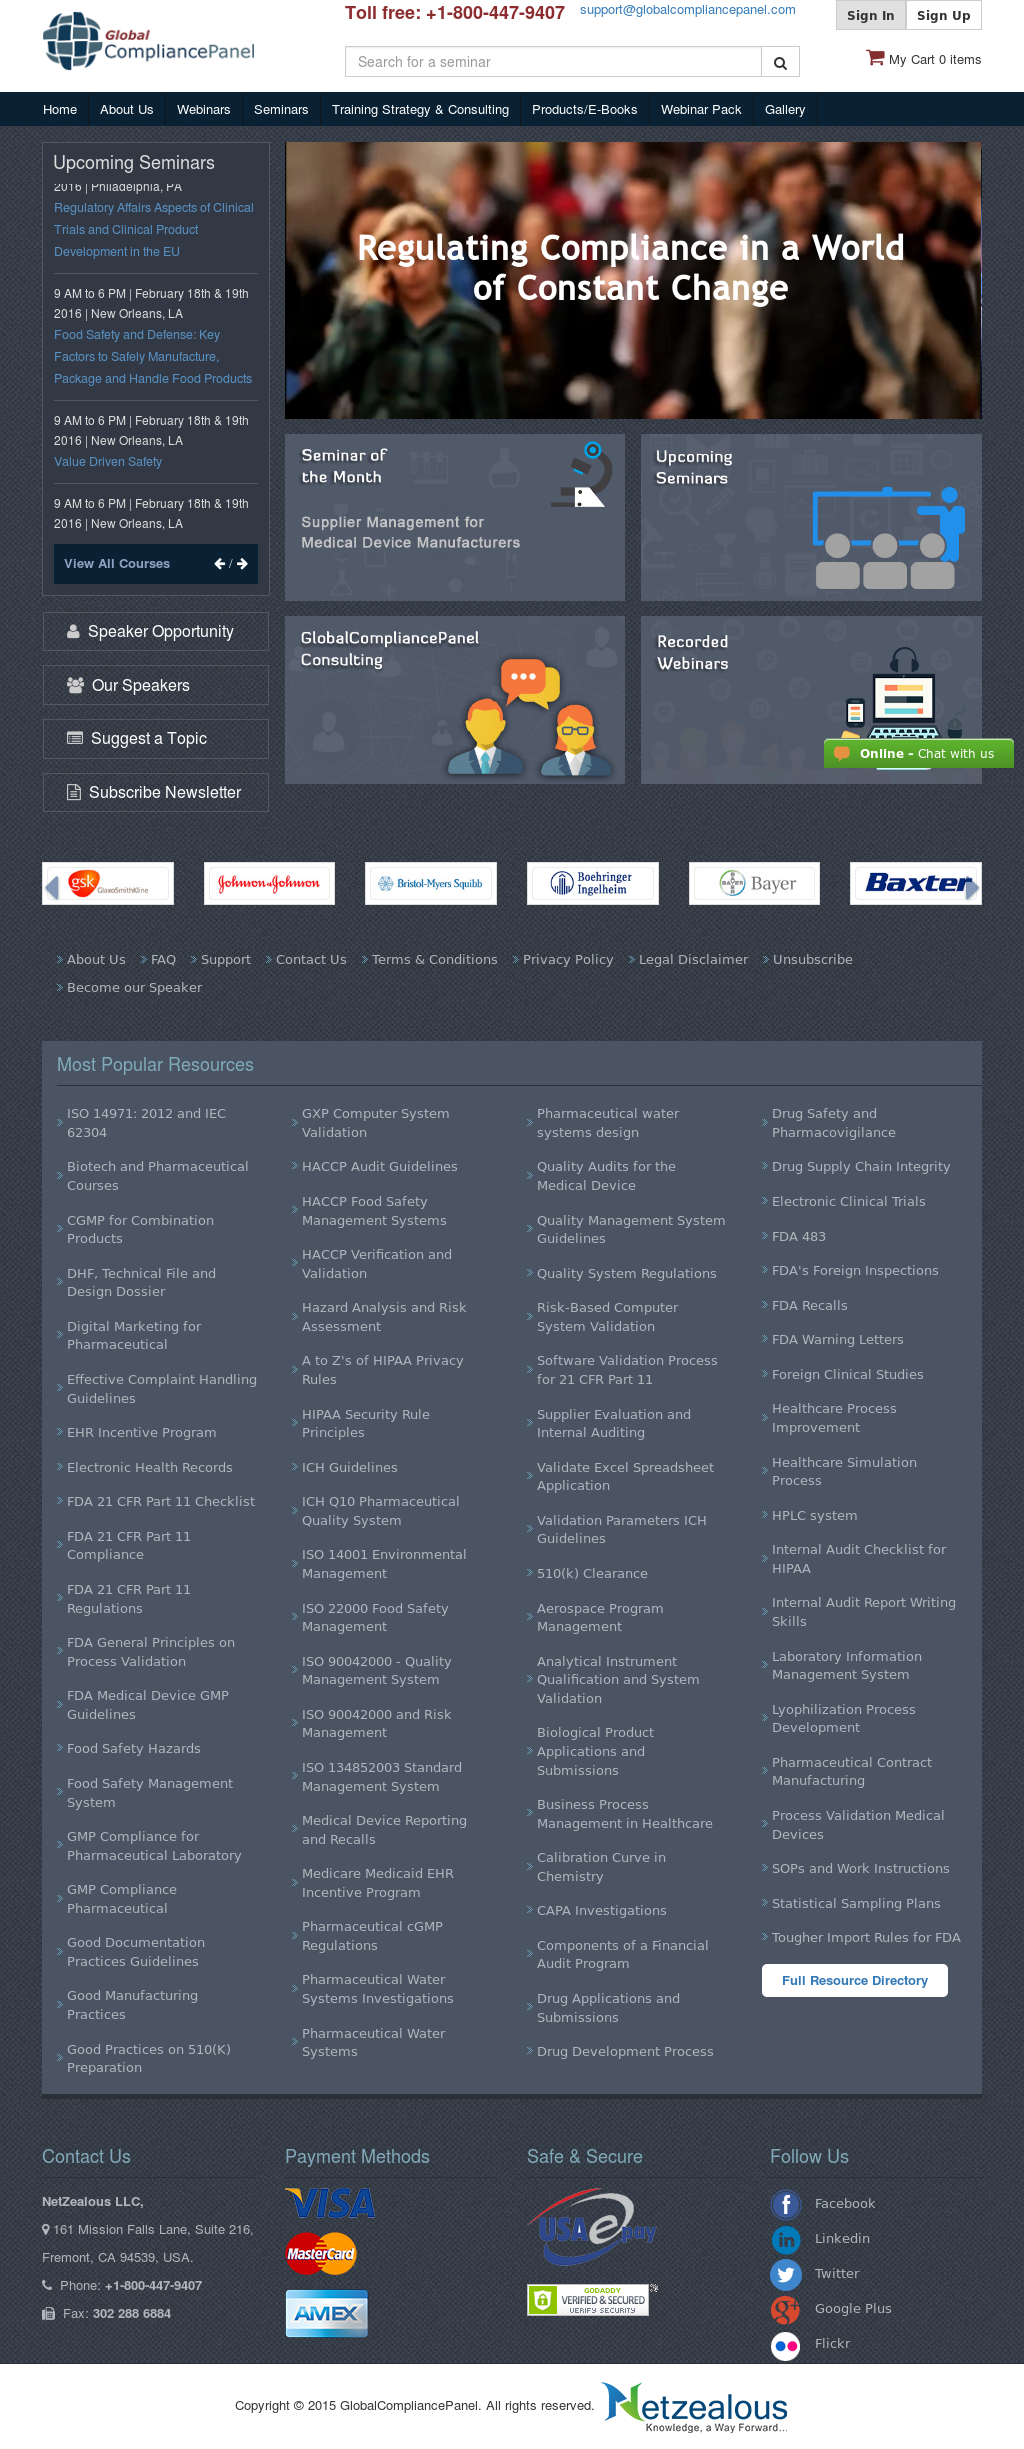 GlobalCompliancePanel Competitors, Revenue and Employees - Owler